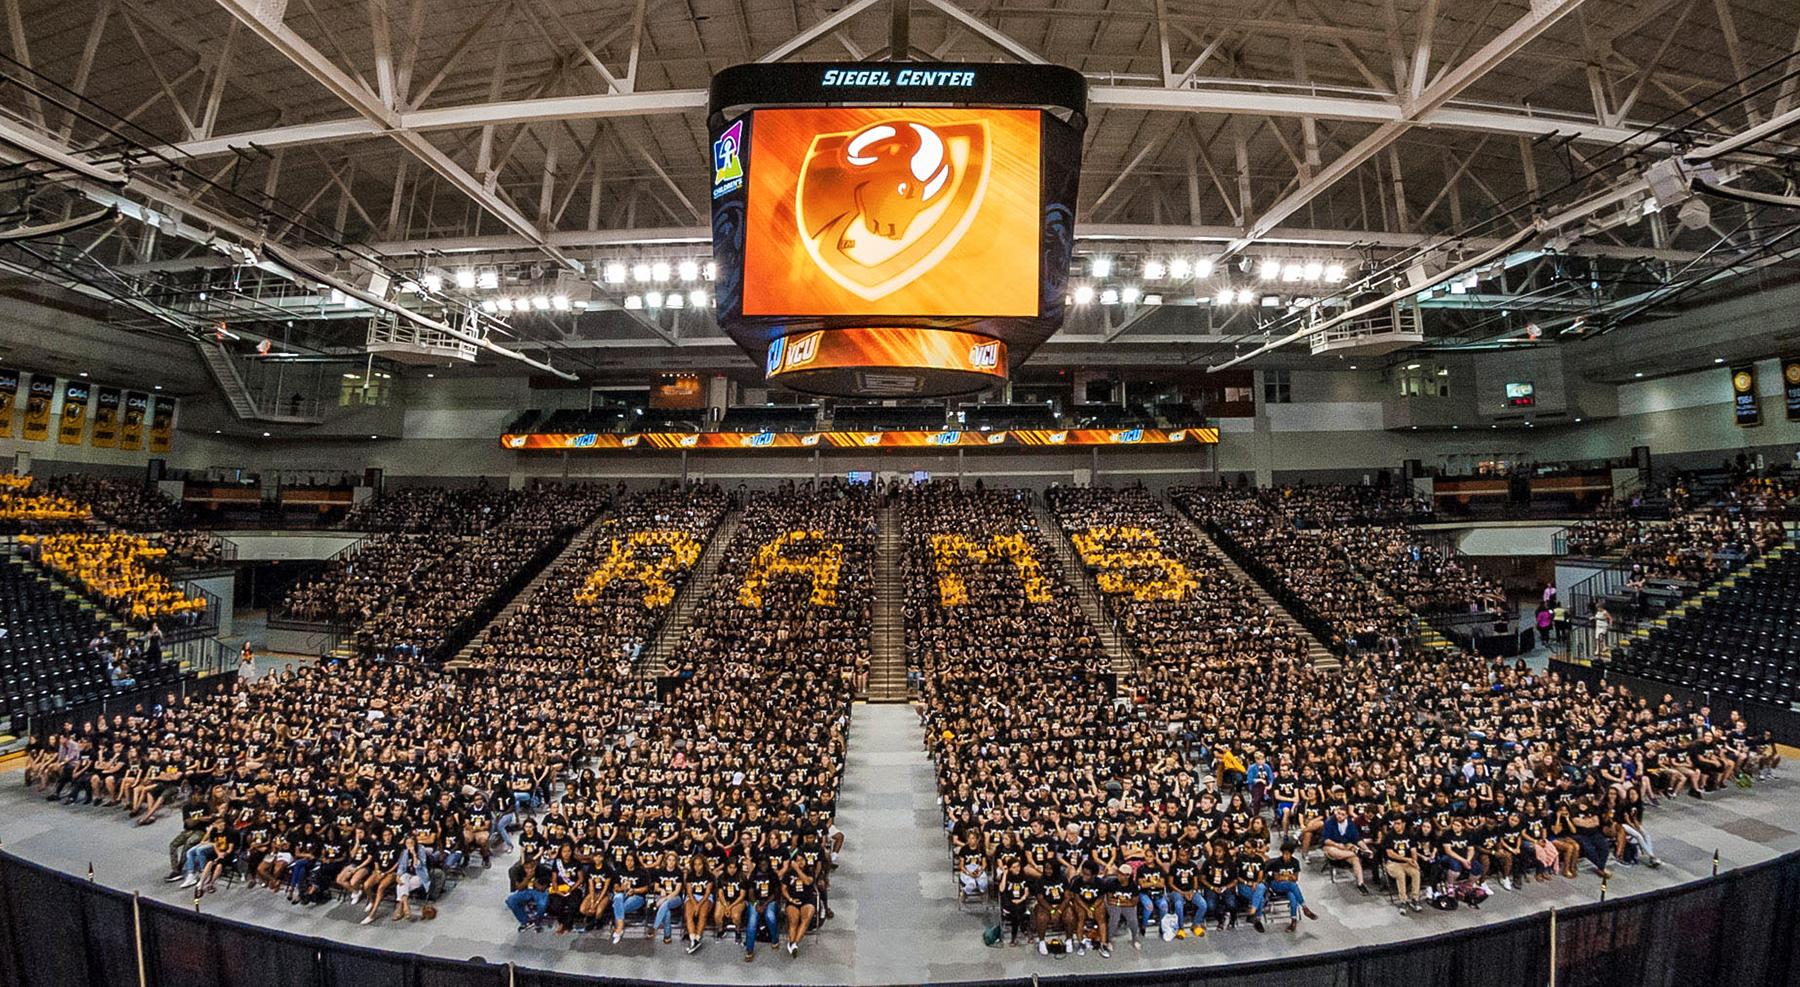 Introducing The Vcu Class Of 2020 Virginia Commonwealth University Vcu University